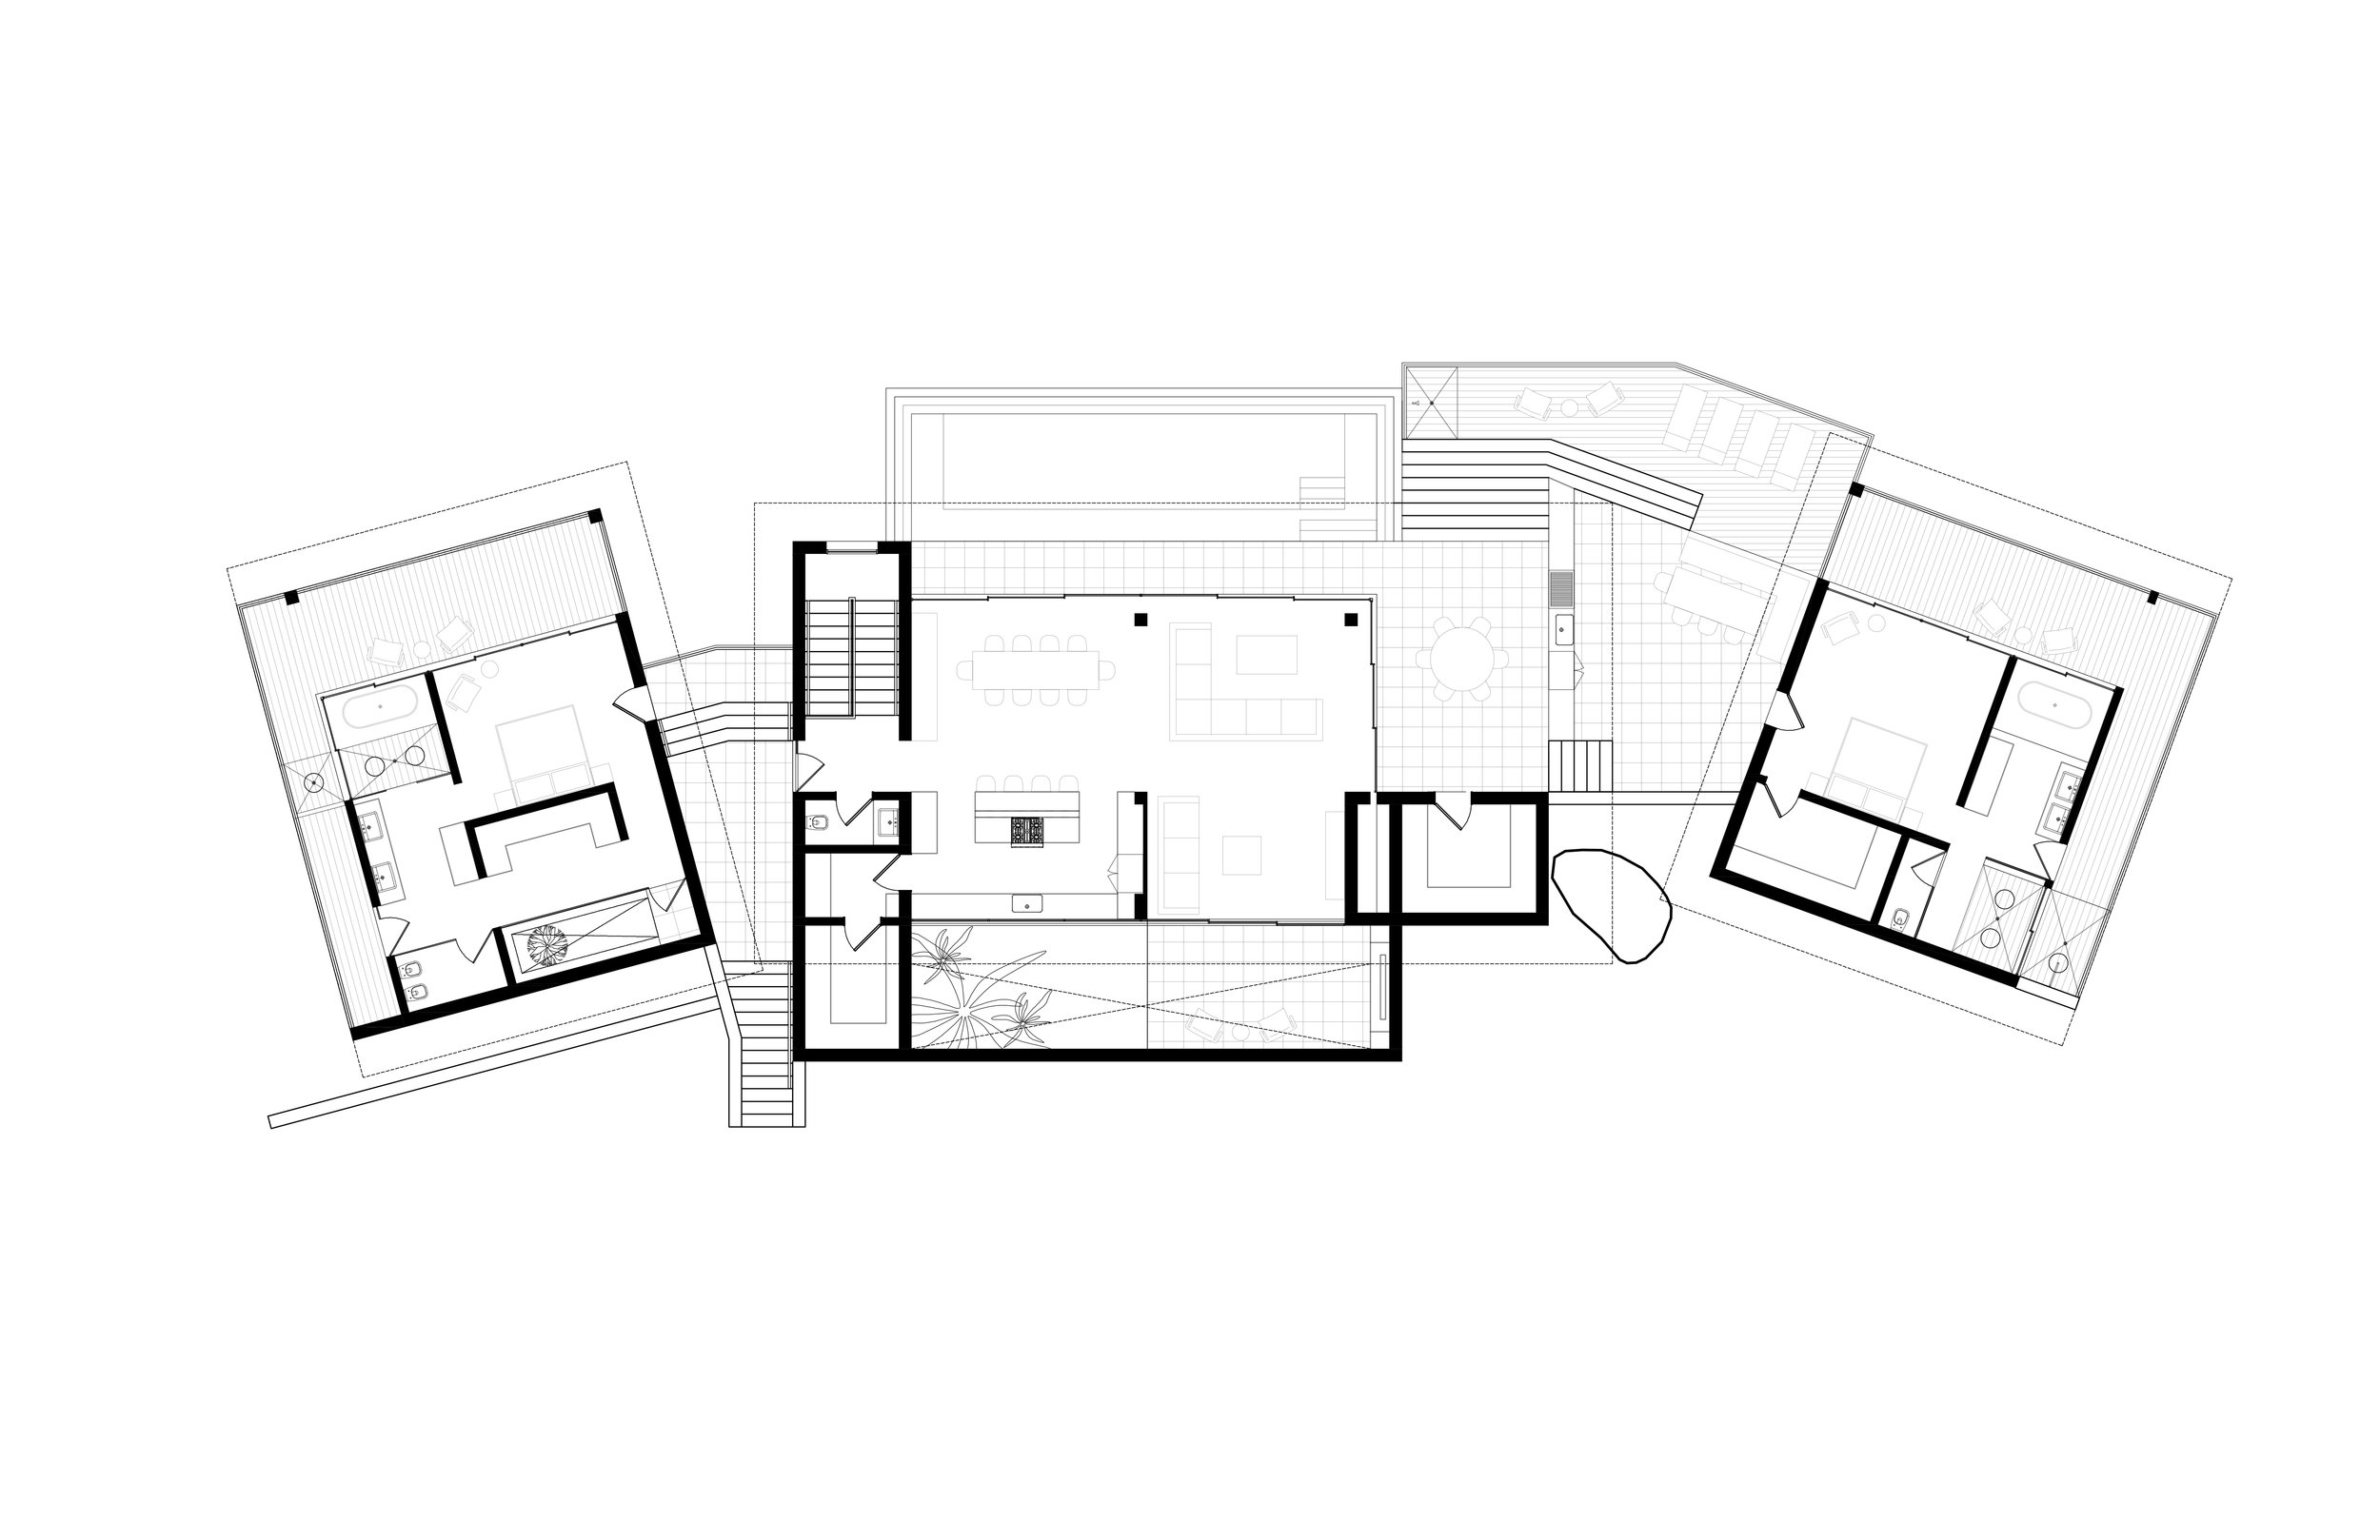 MTAD_WINDY HILL PLAN 01.jpg